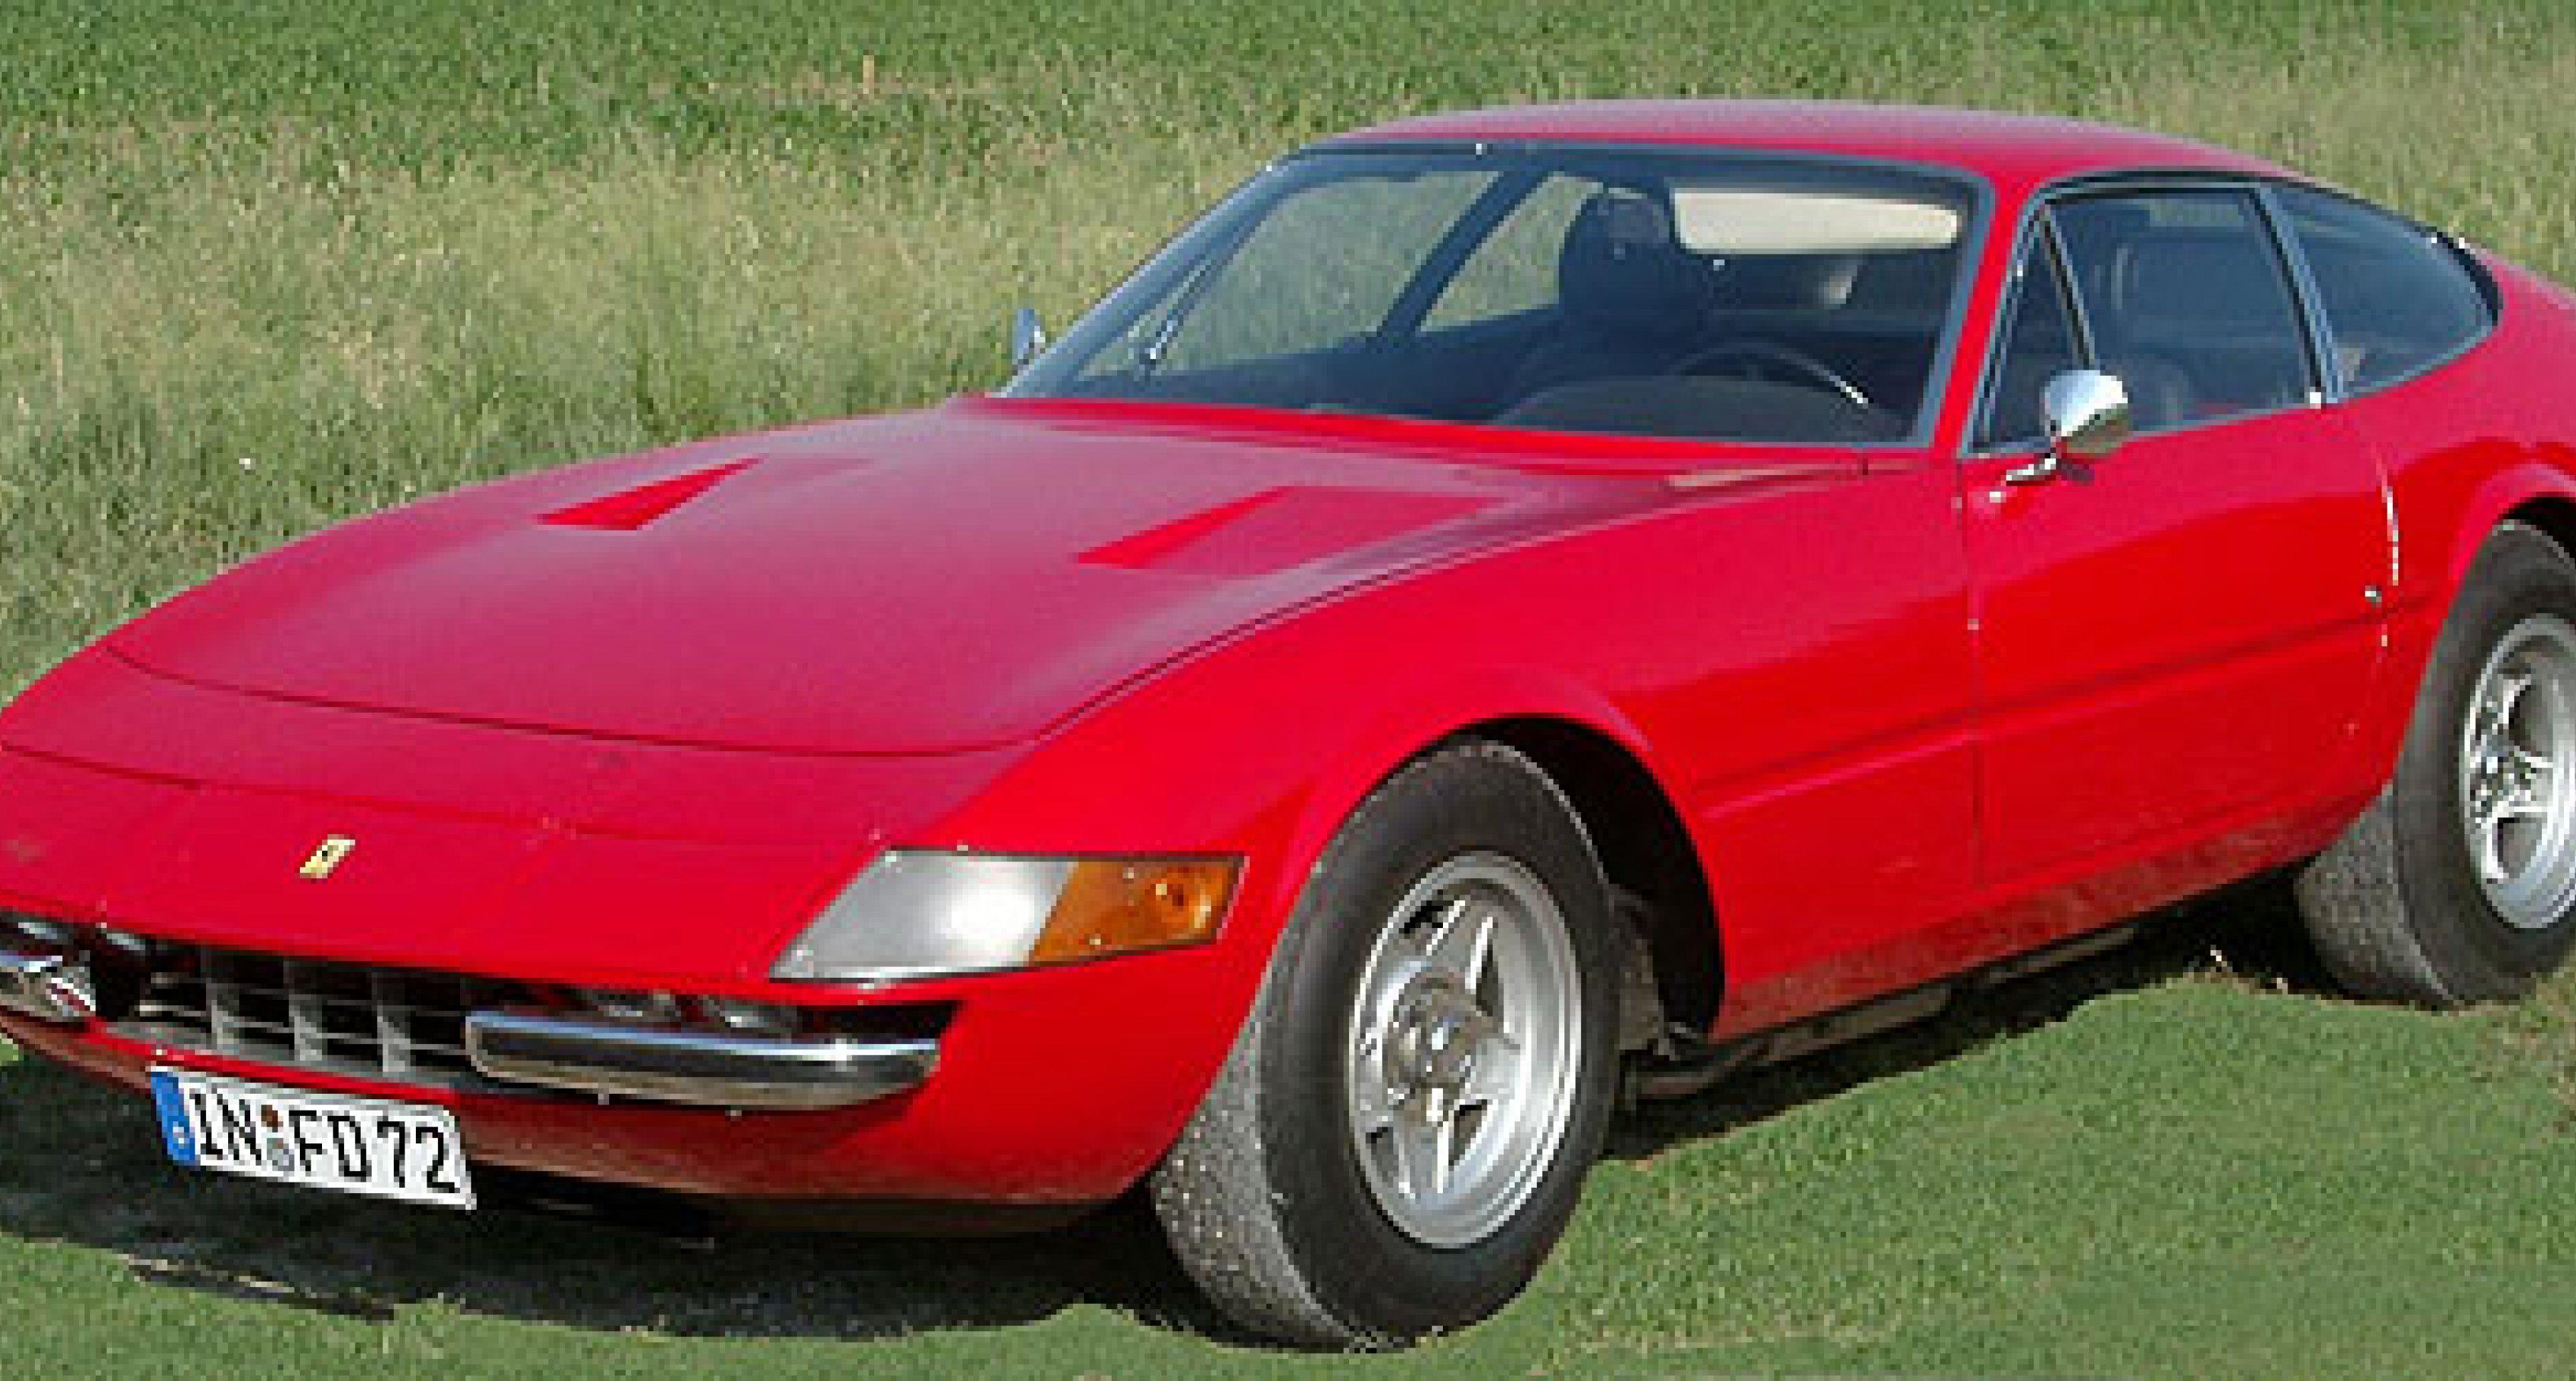 Ferrari Lusso, 275 GTS und Daytona (3)